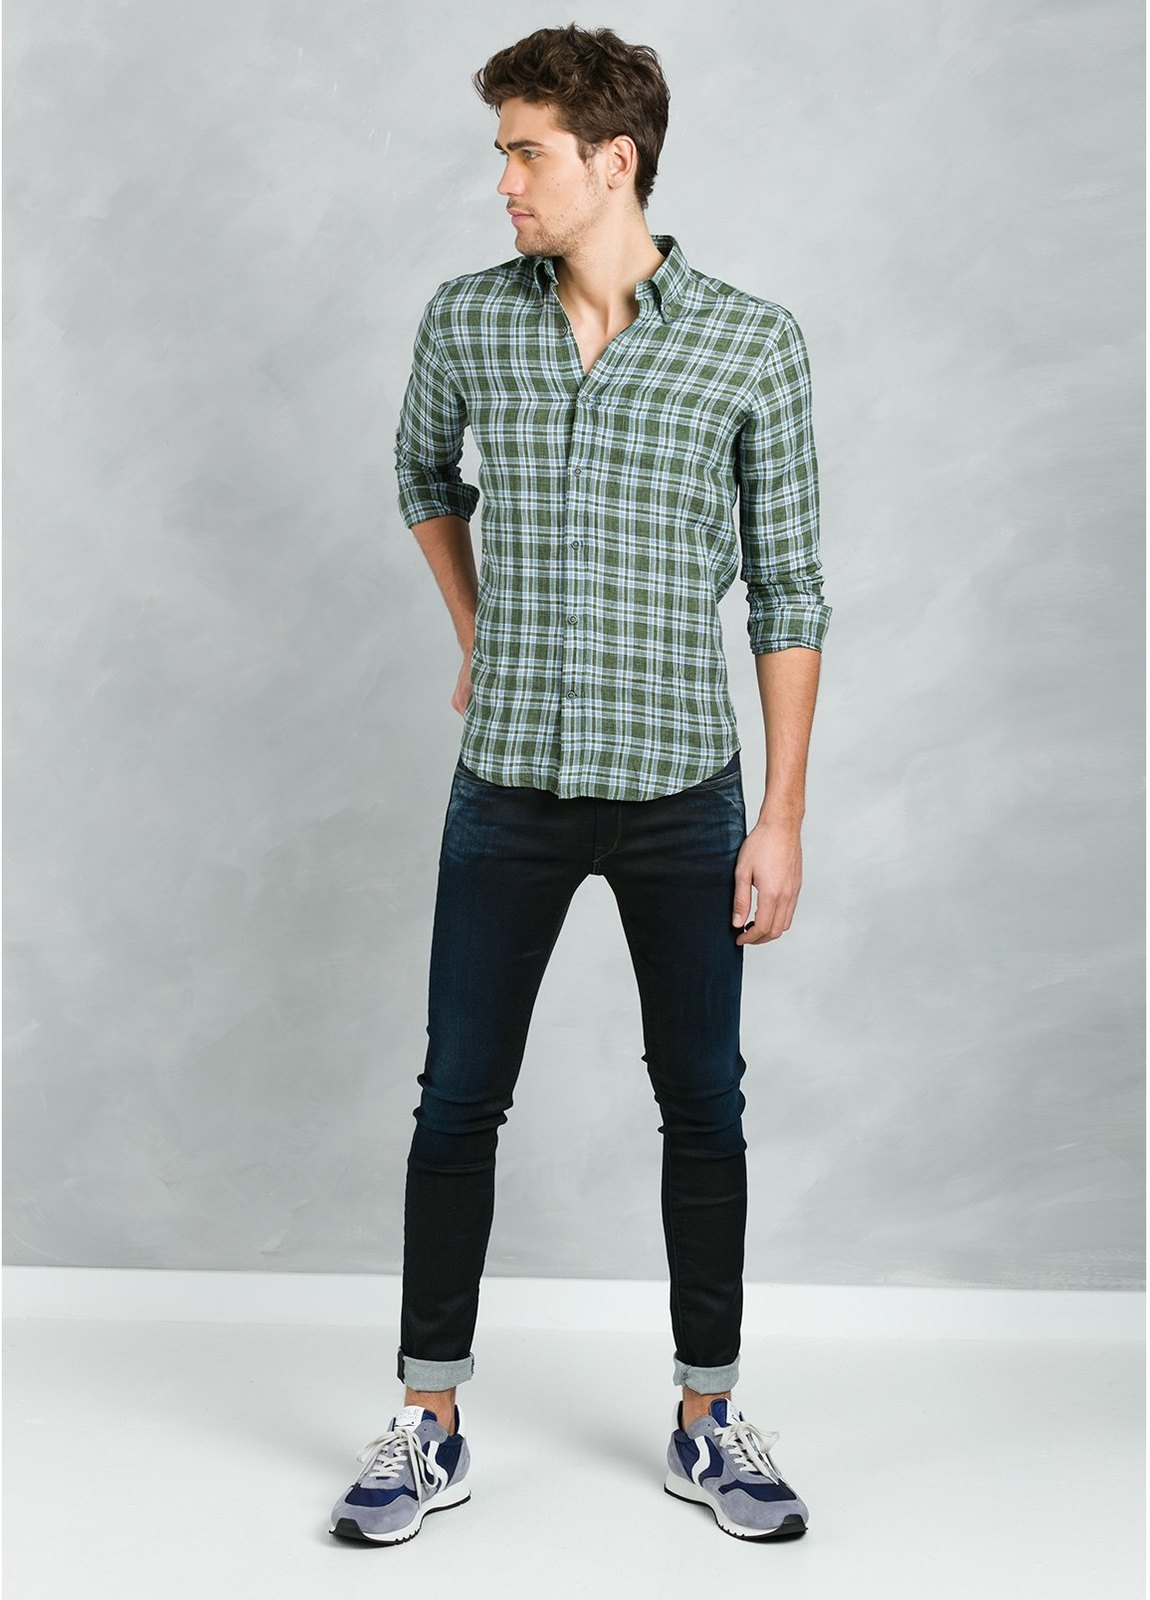 Camisa Leisure Wear REGULAR FIT Modelo BOTTON DOWN estampado cuadros verdes , 100% Lino - Ítem1